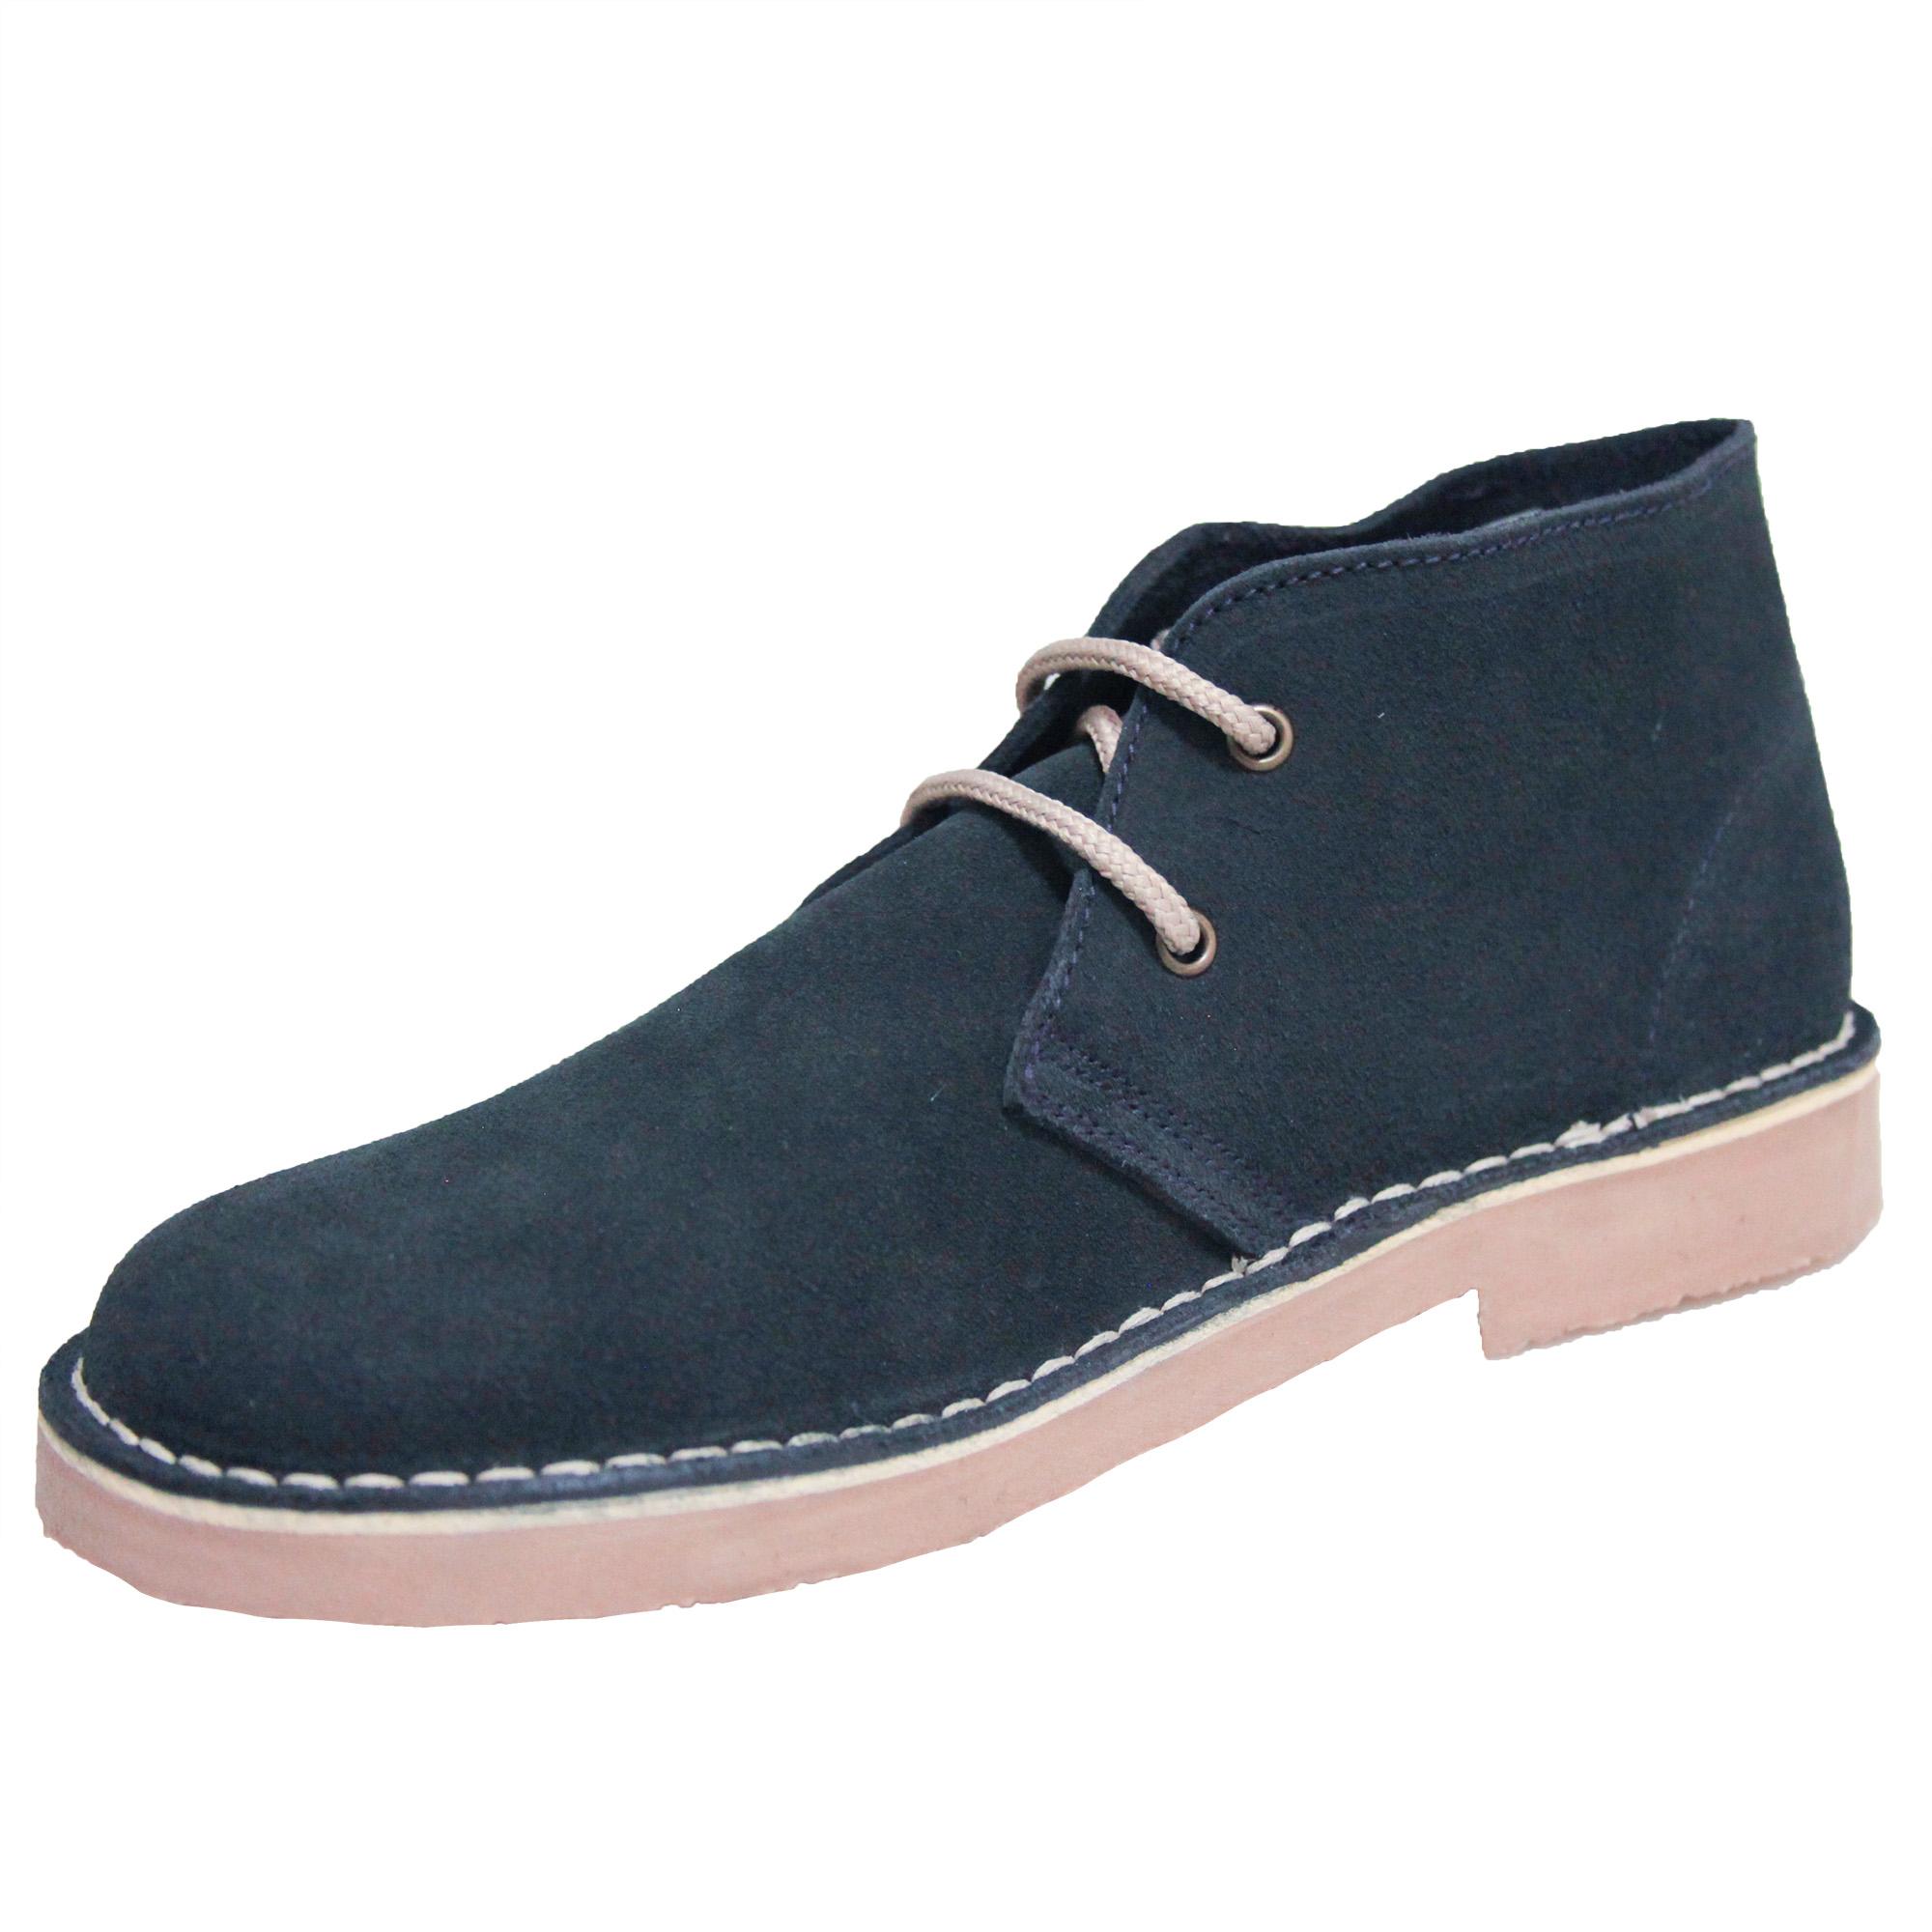 Roamers Mens Real Suede Unlined Desert Boots (6 UK) (Bordeaux)